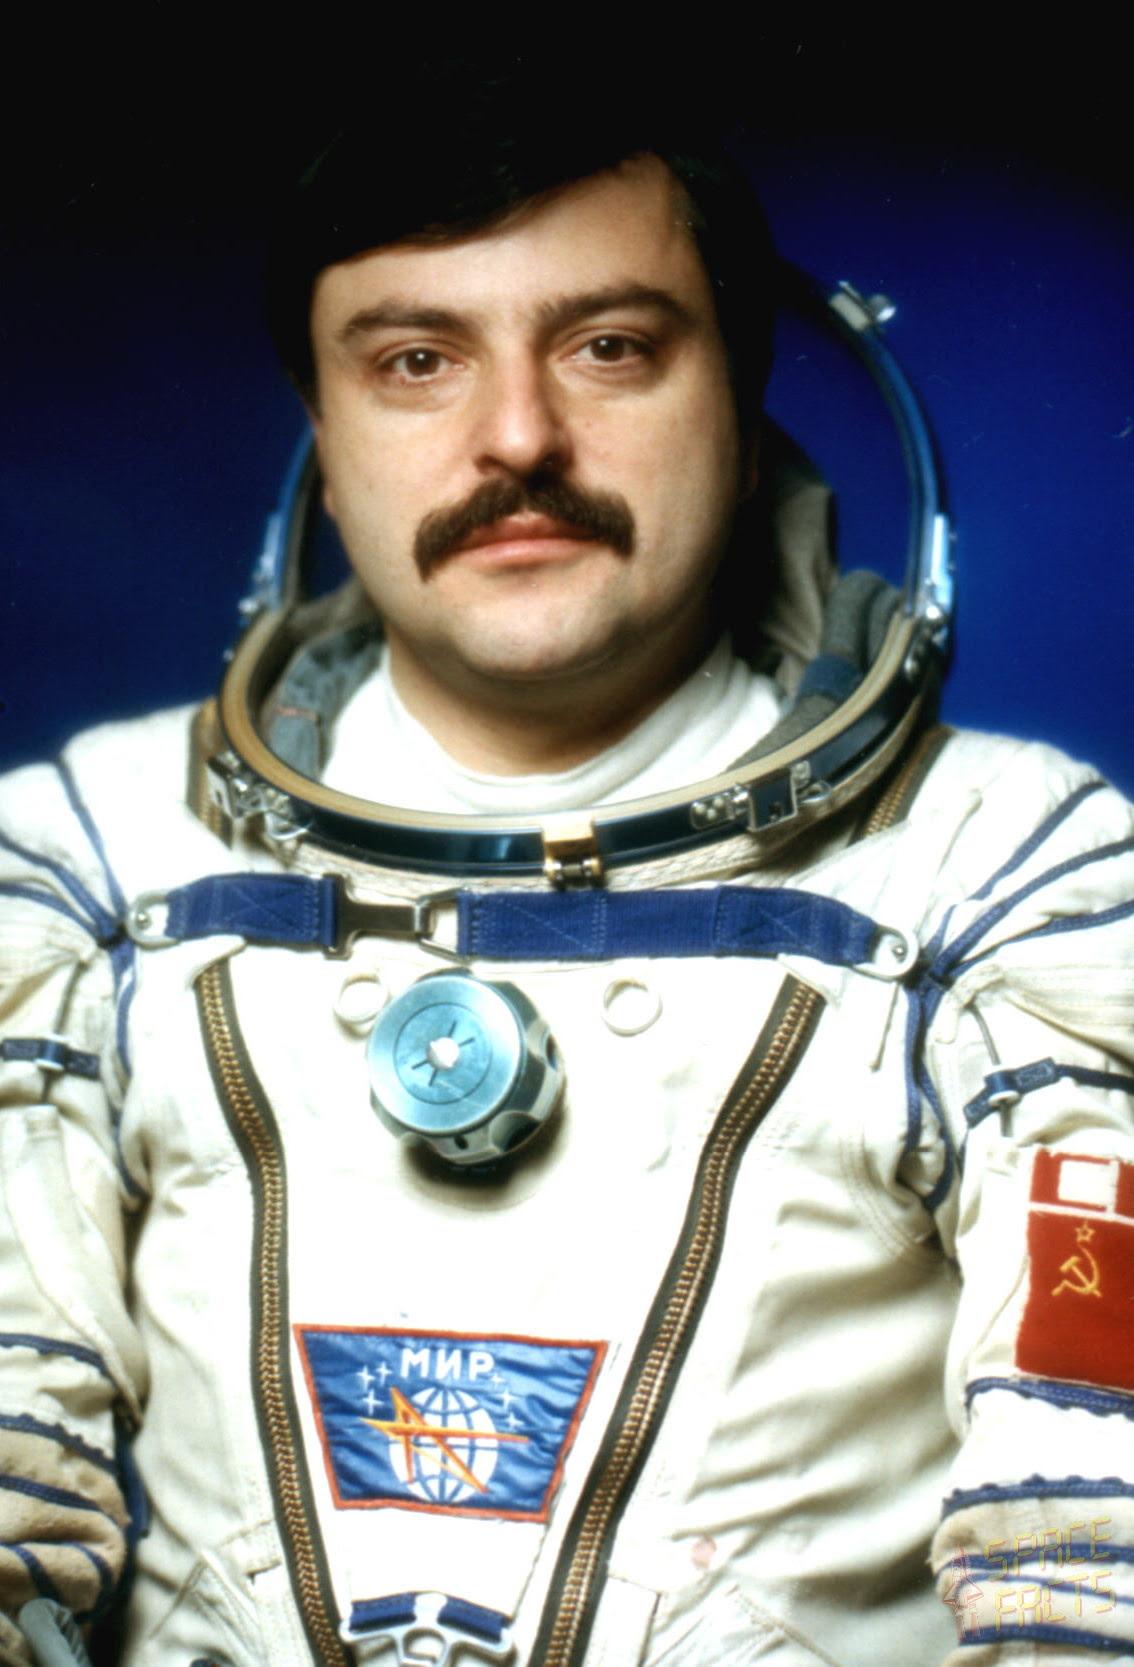 http://www.spacefacts.de/bios/portraits_hi/cosmonauts/manarov_musa.jpg